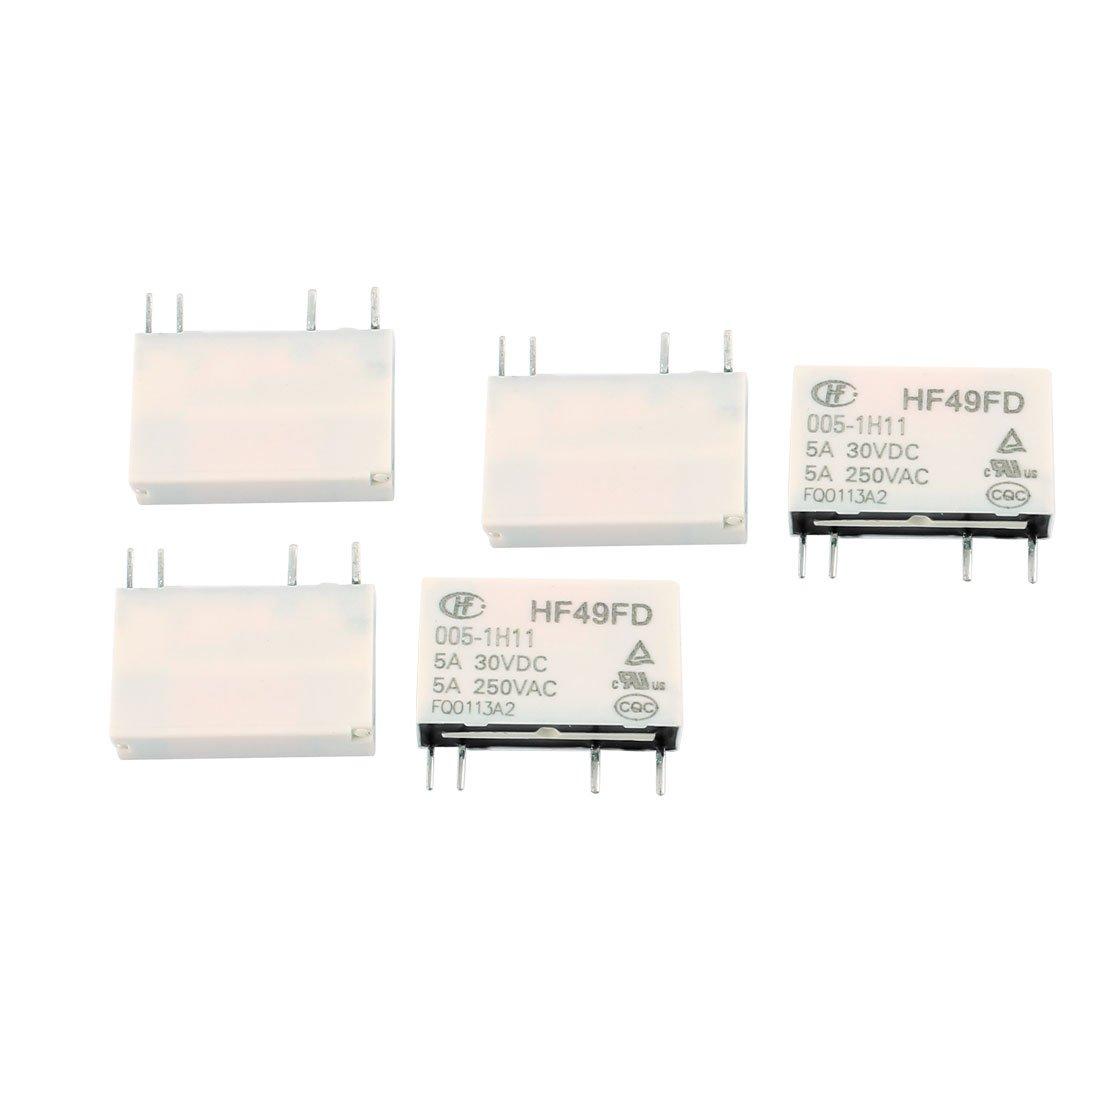 sourcingmap® 5 pcs 30VDC 250VAC 5A 4 Terminal no 1 NO HF49FD/005-1H11 Relais puissance sourcing map SYNCTEA000983